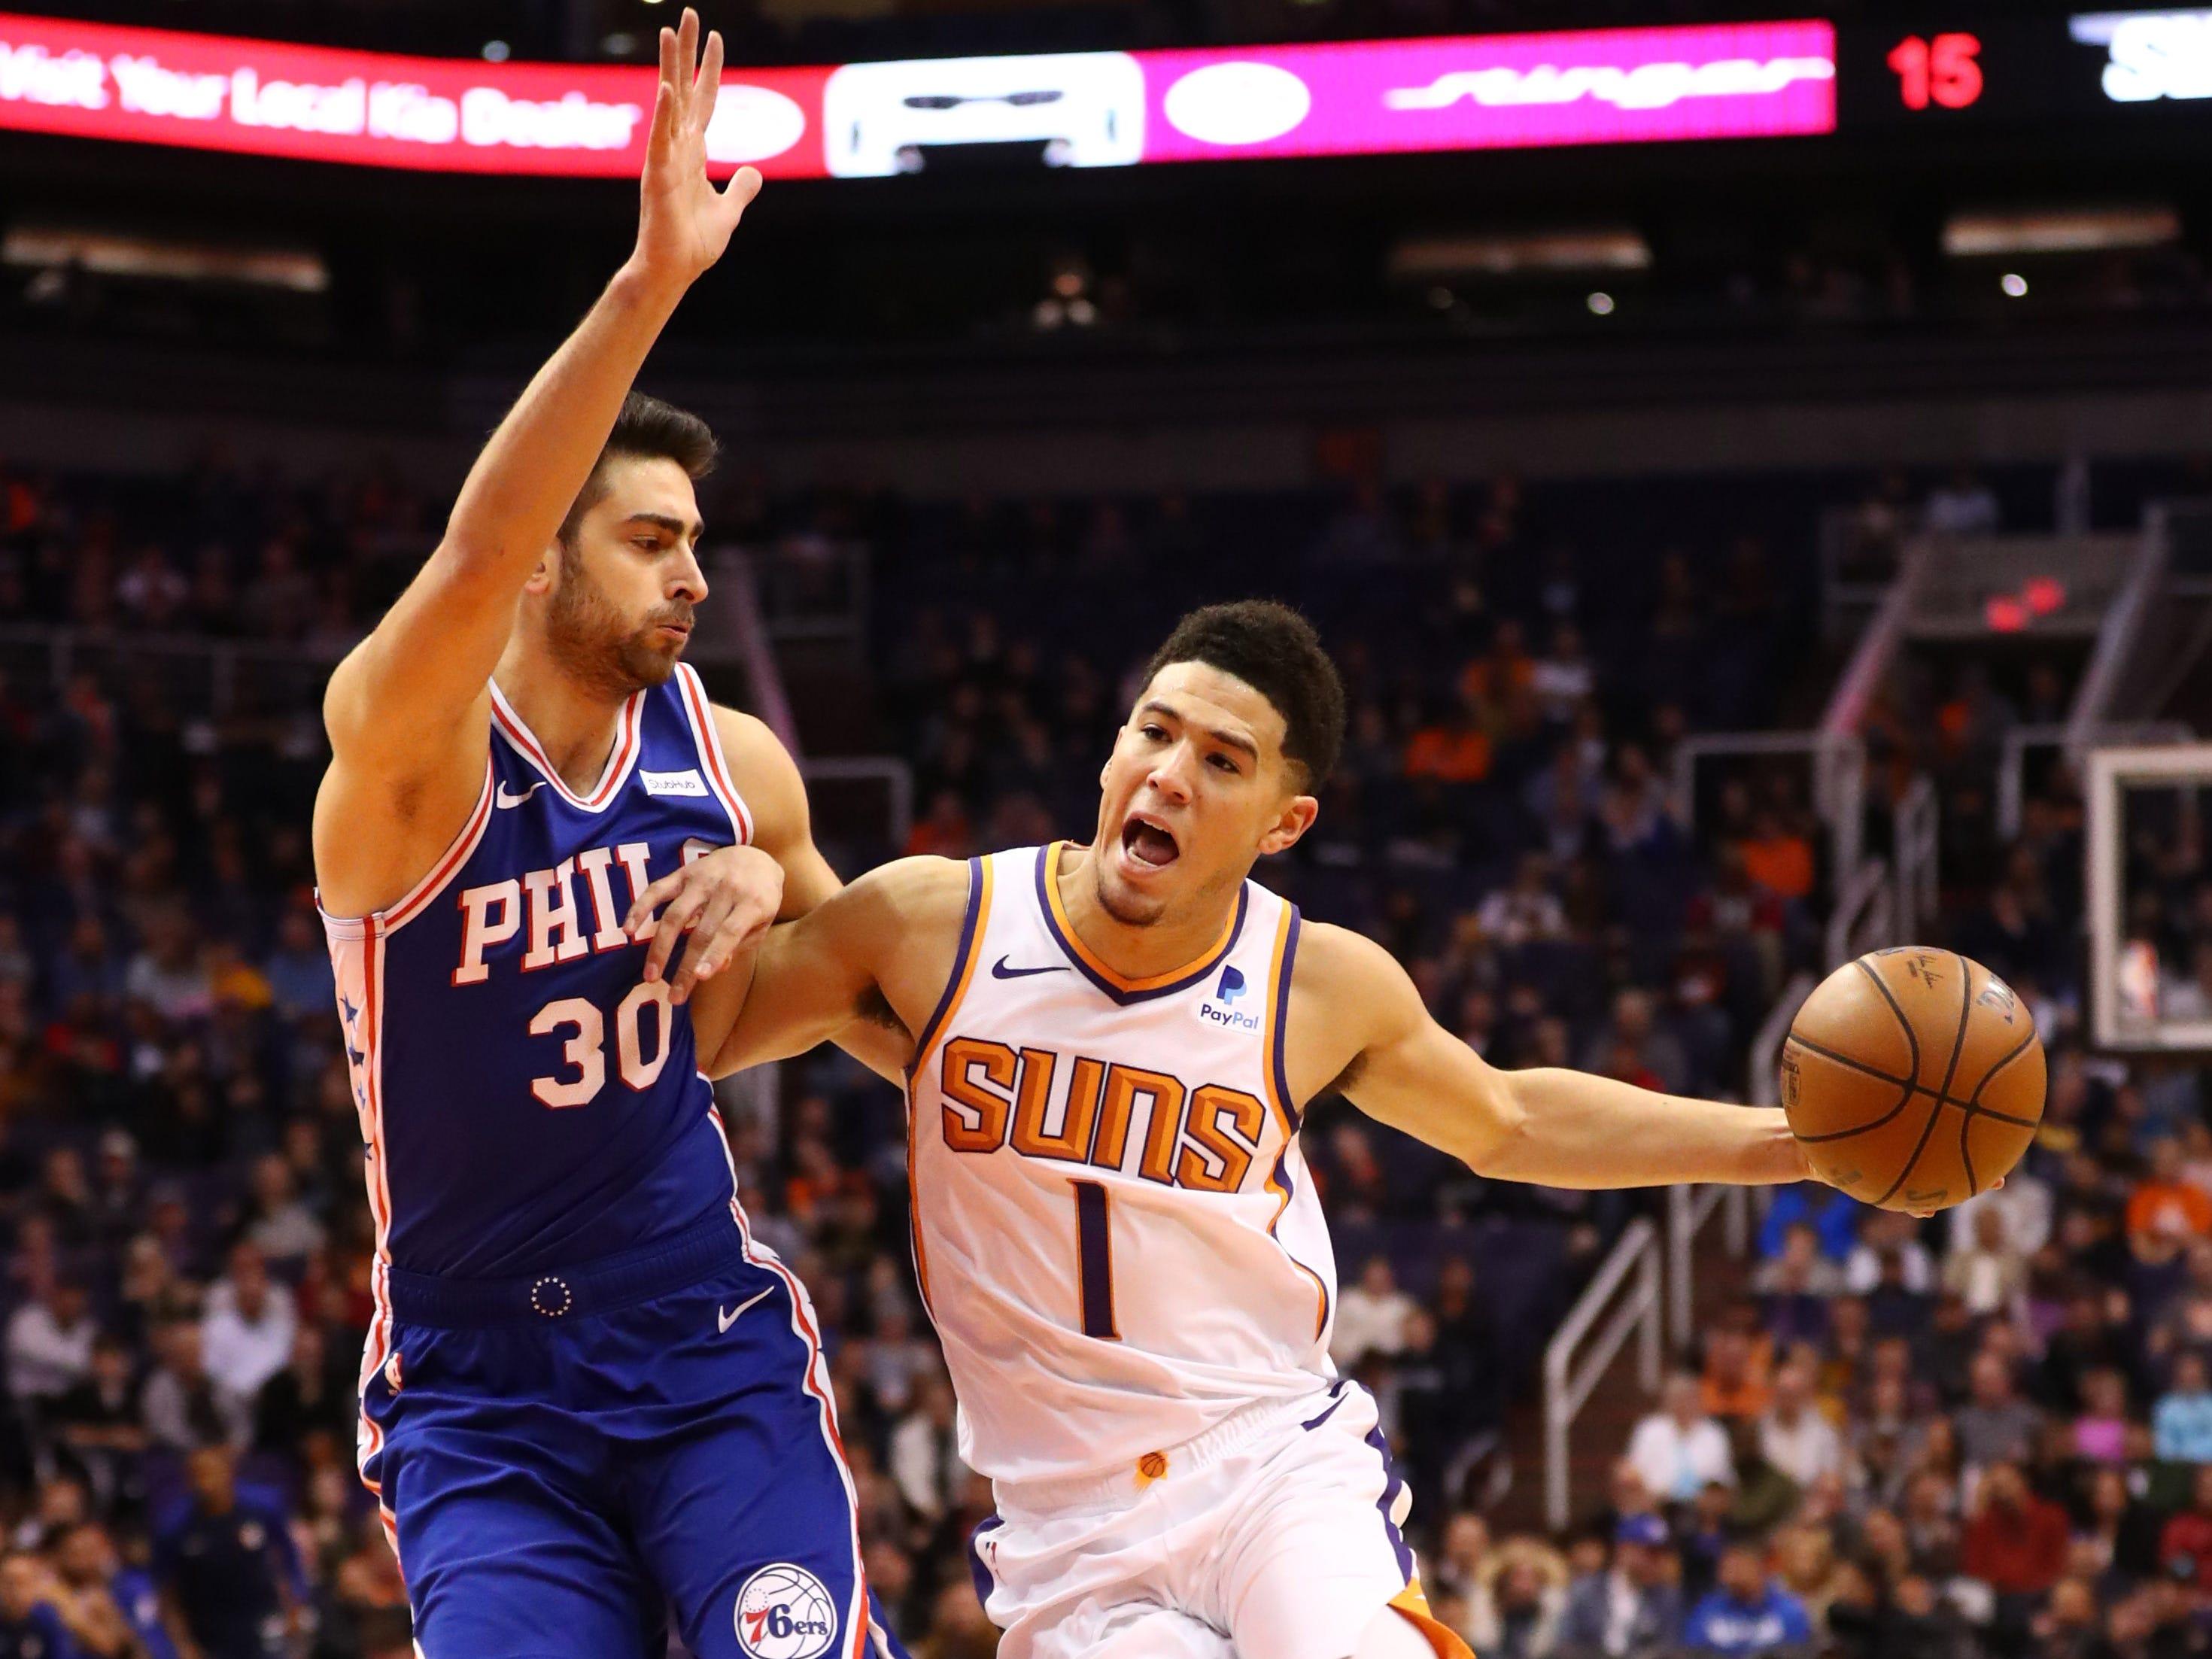 Jan 2, 2019; Phoenix, AZ, USA; Phoenix Suns guard Devin Booker (1) against Philadelphia 76ers guard Furkan Korkmaz (30) in the first half at Talking Stick Resort Arena. Mandatory Credit: Mark J. Rebilas-USA TODAY Sports